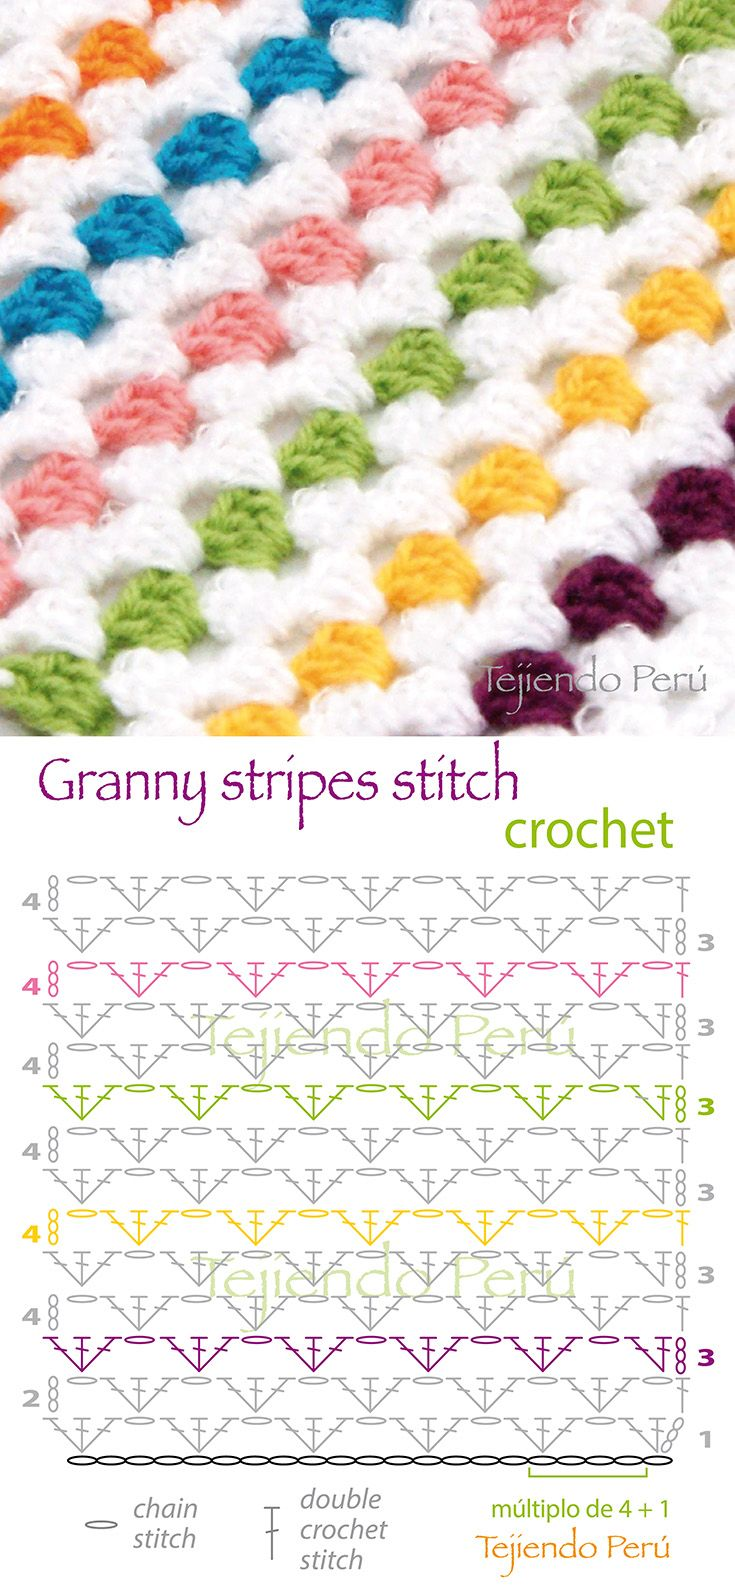 Crochet granny stripes stitch diagram! (Pattern or chart) | Ideas ...